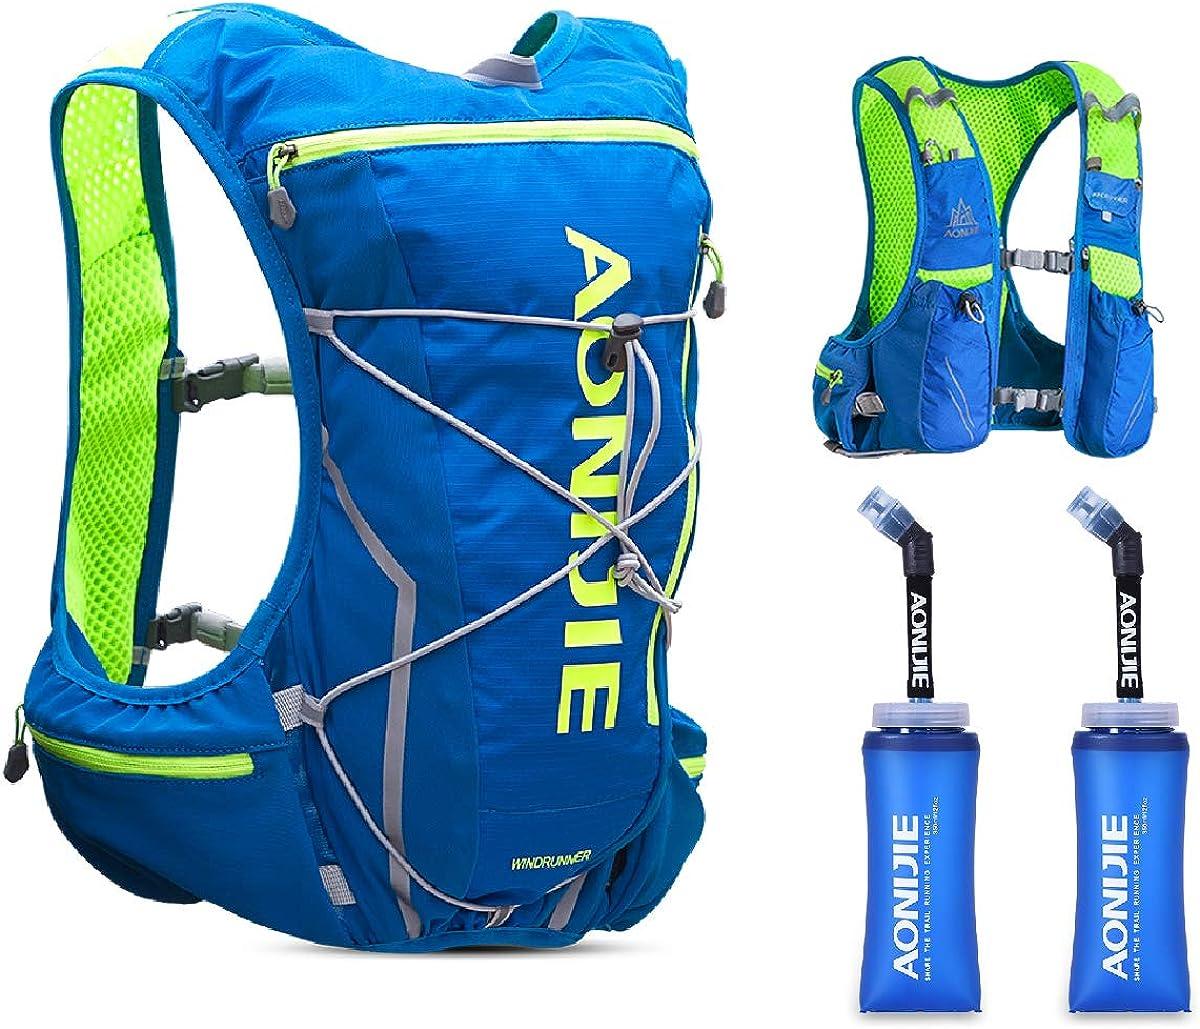 JEELAD Hydration Vest 5L Backpack Direct sale of manufacturer Pack R Trail Running OFFicial mail order